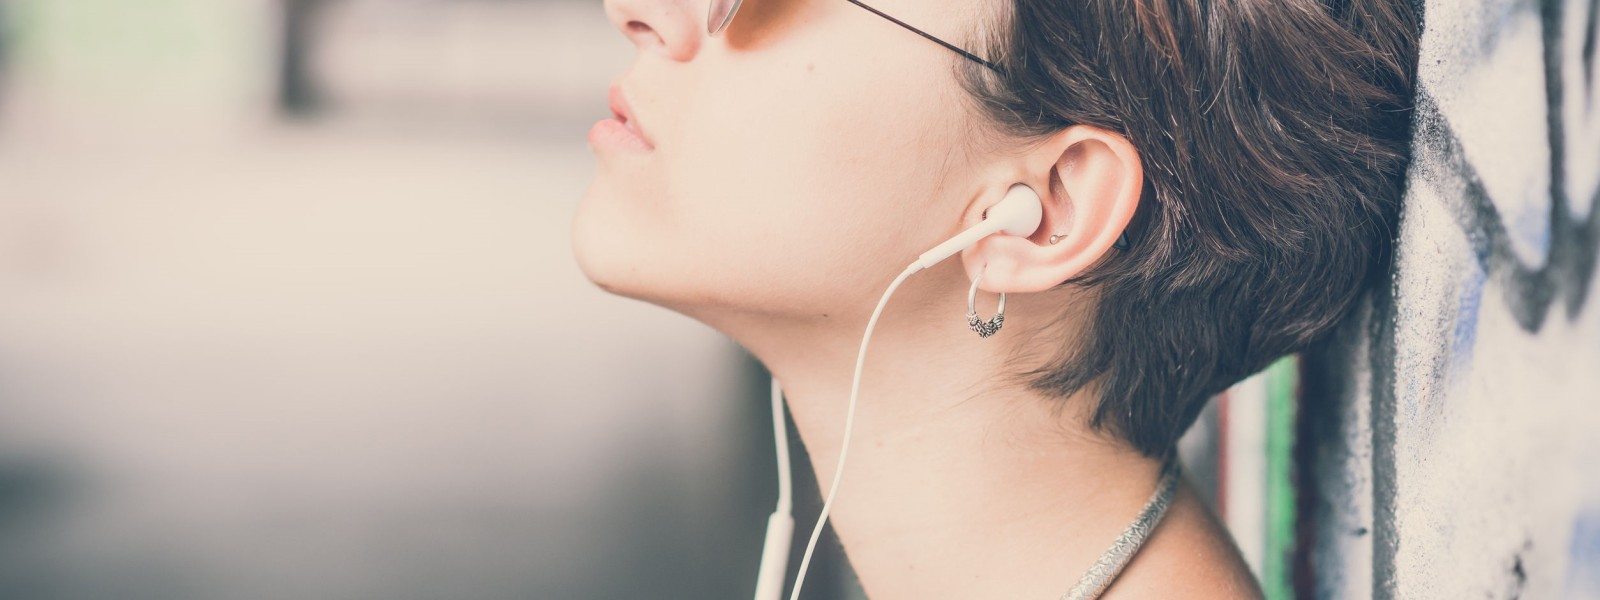 woman headphones wall